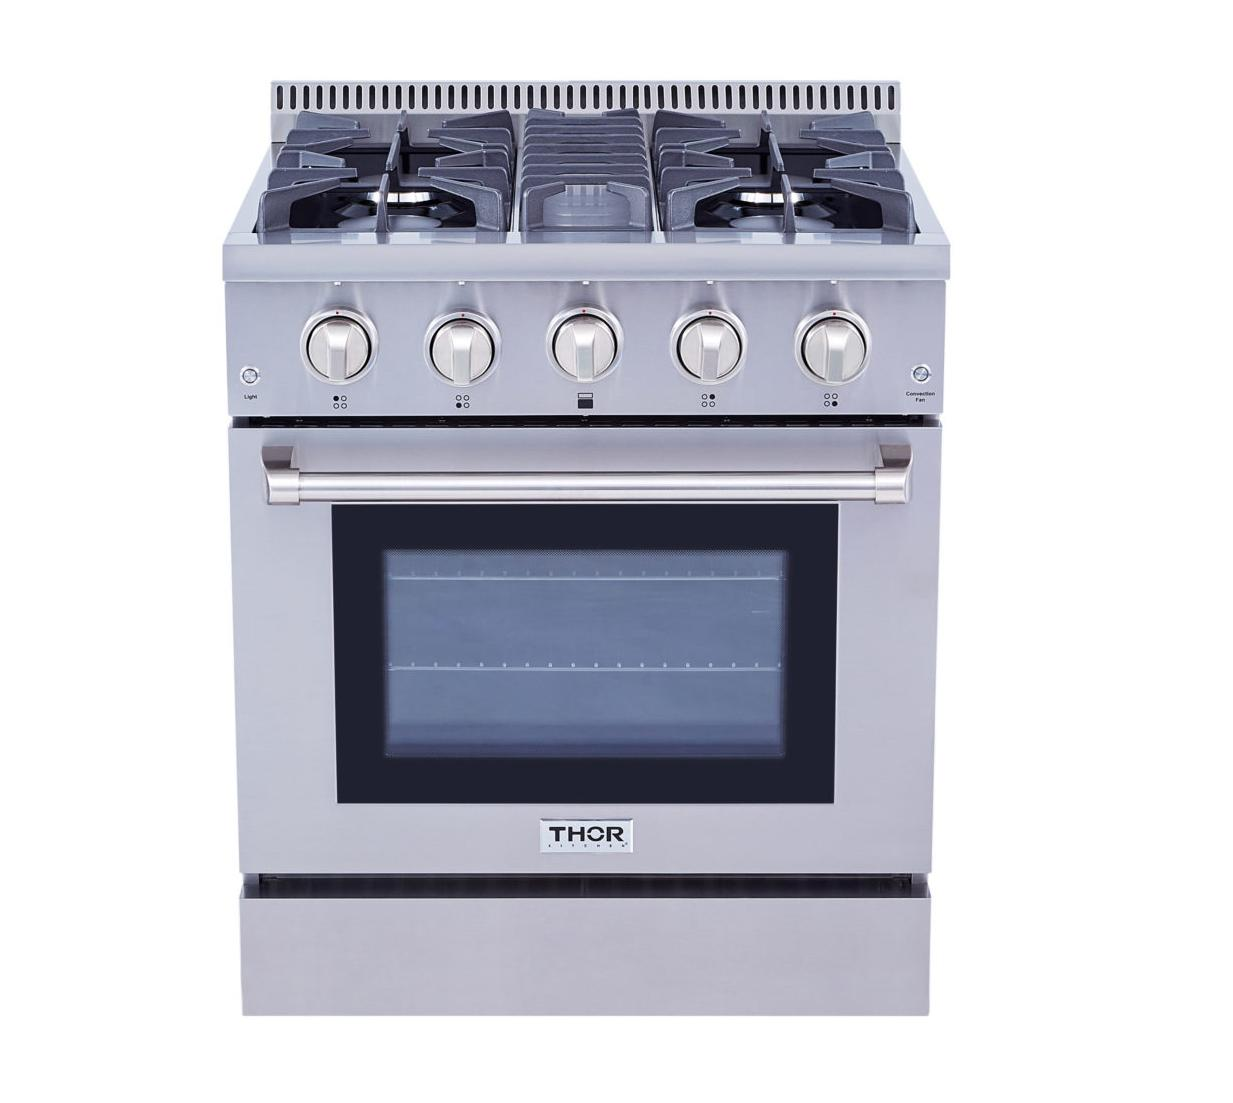 Thor Kitchen30 Inch Professional Gas Range In Stainless Steel - Liquid Propane